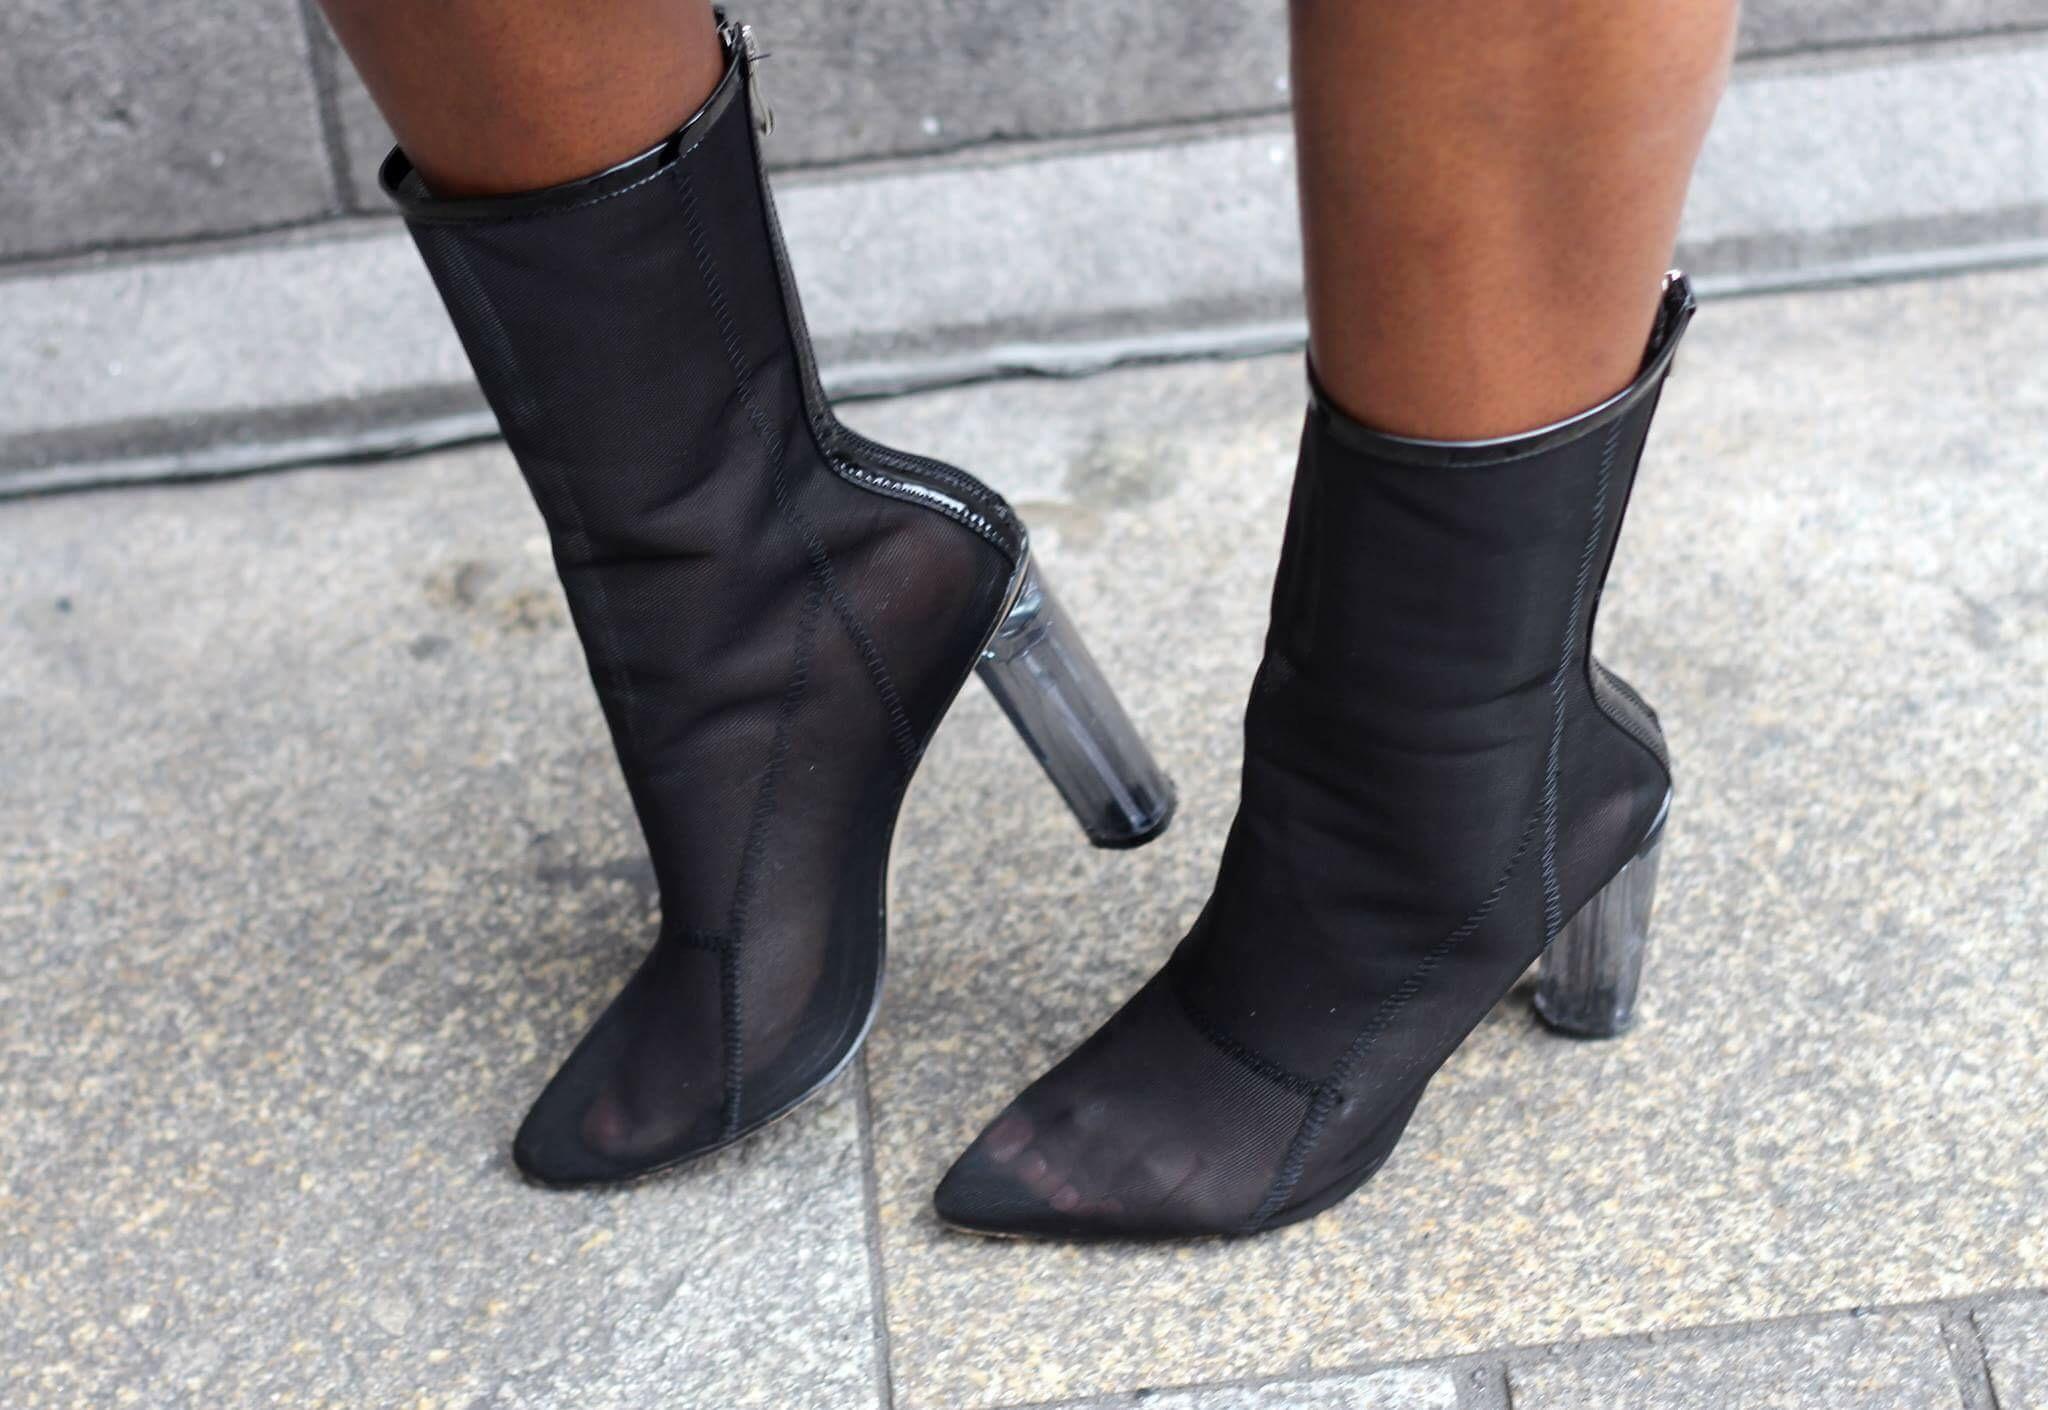 Billykiss Azeez. Your Favourite Muse. Fashion Irish Blogger. Urban Street style. Zara. Pretty Little Things. Fashionnova. La Moda Shoes.